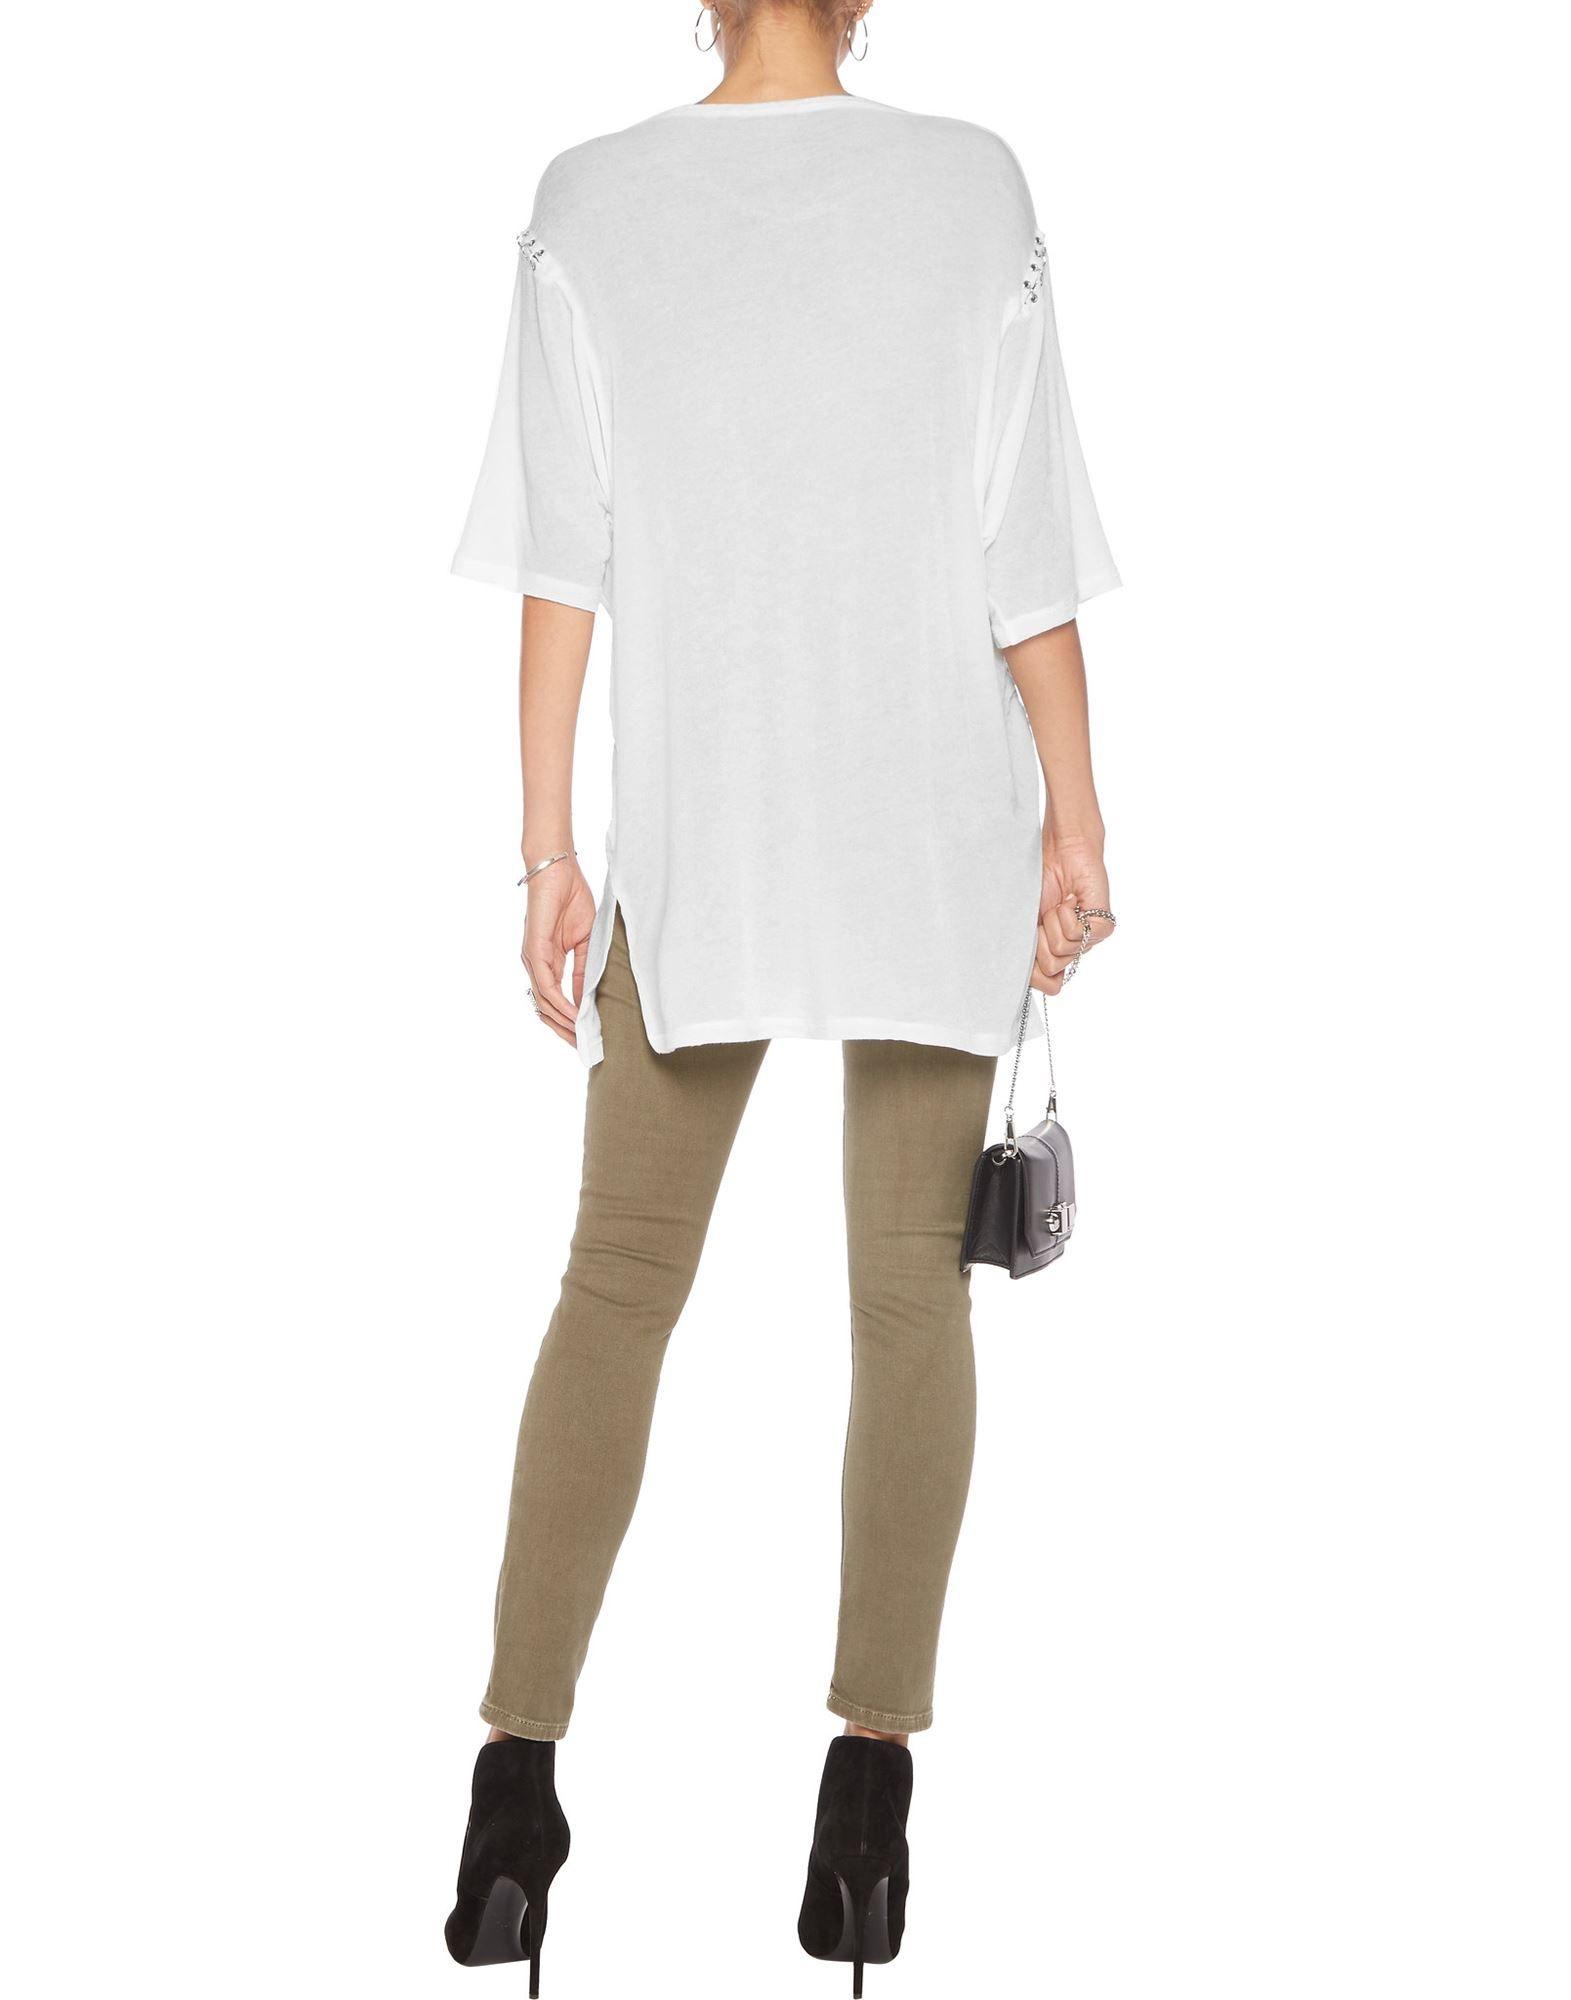 KNITWEAR Woman Iro.Jeans White Lyocell